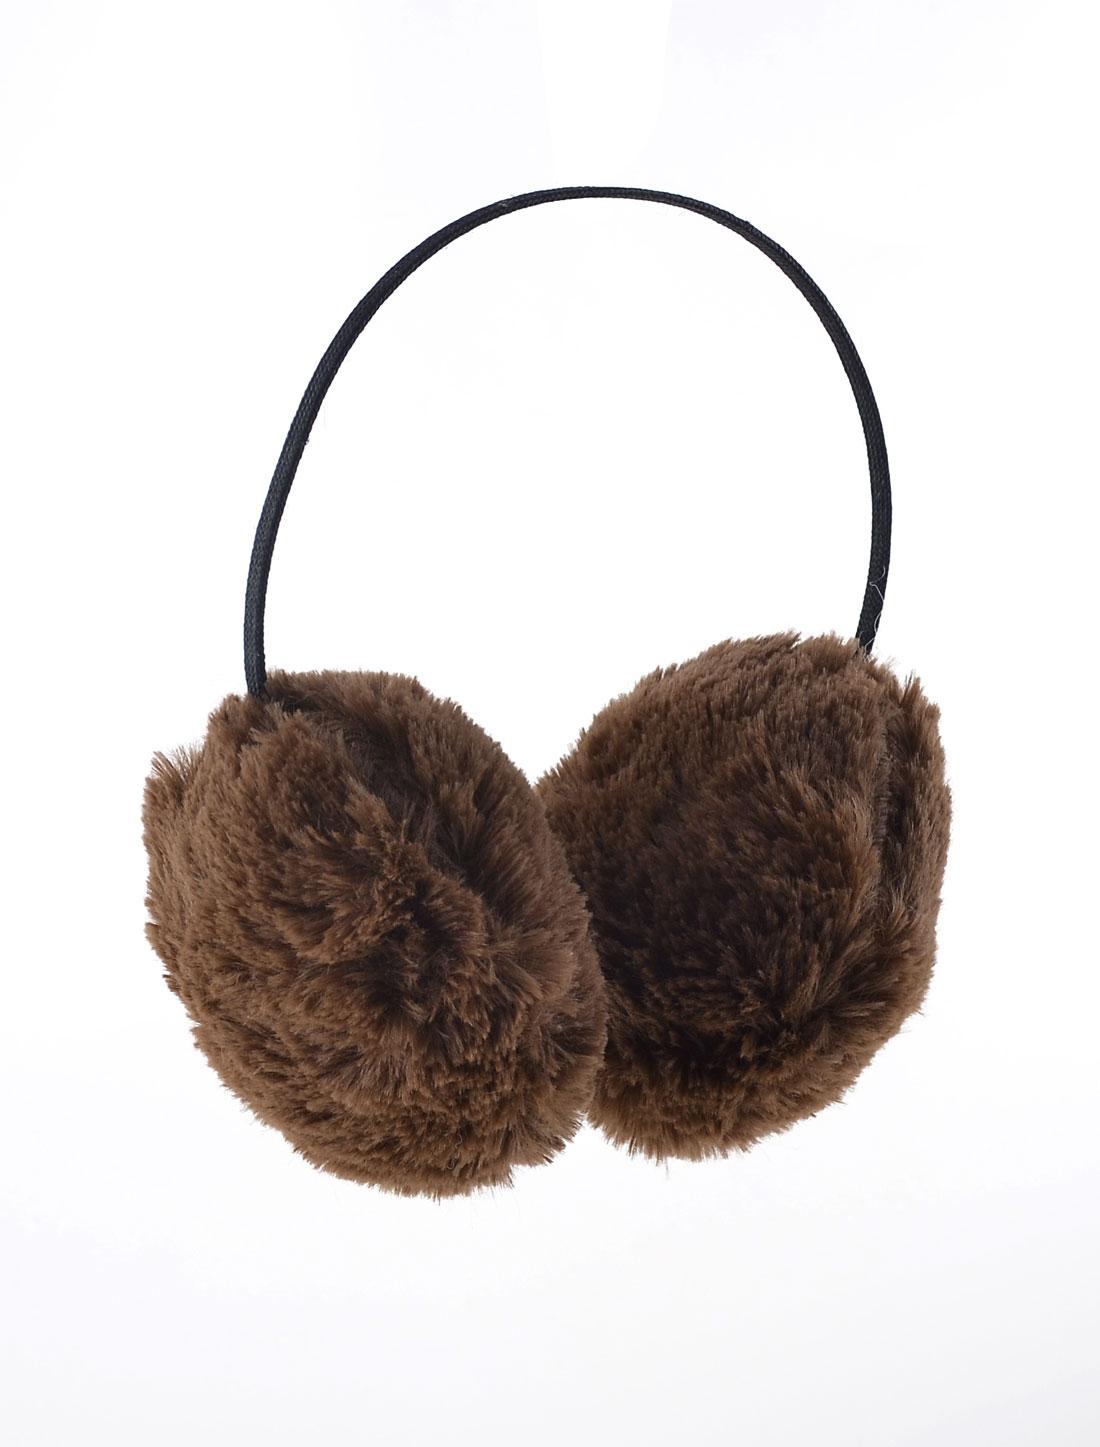 Coffee Color Soft Plush Ear Winter Warmer Earlap Earmuffs for Lady Man